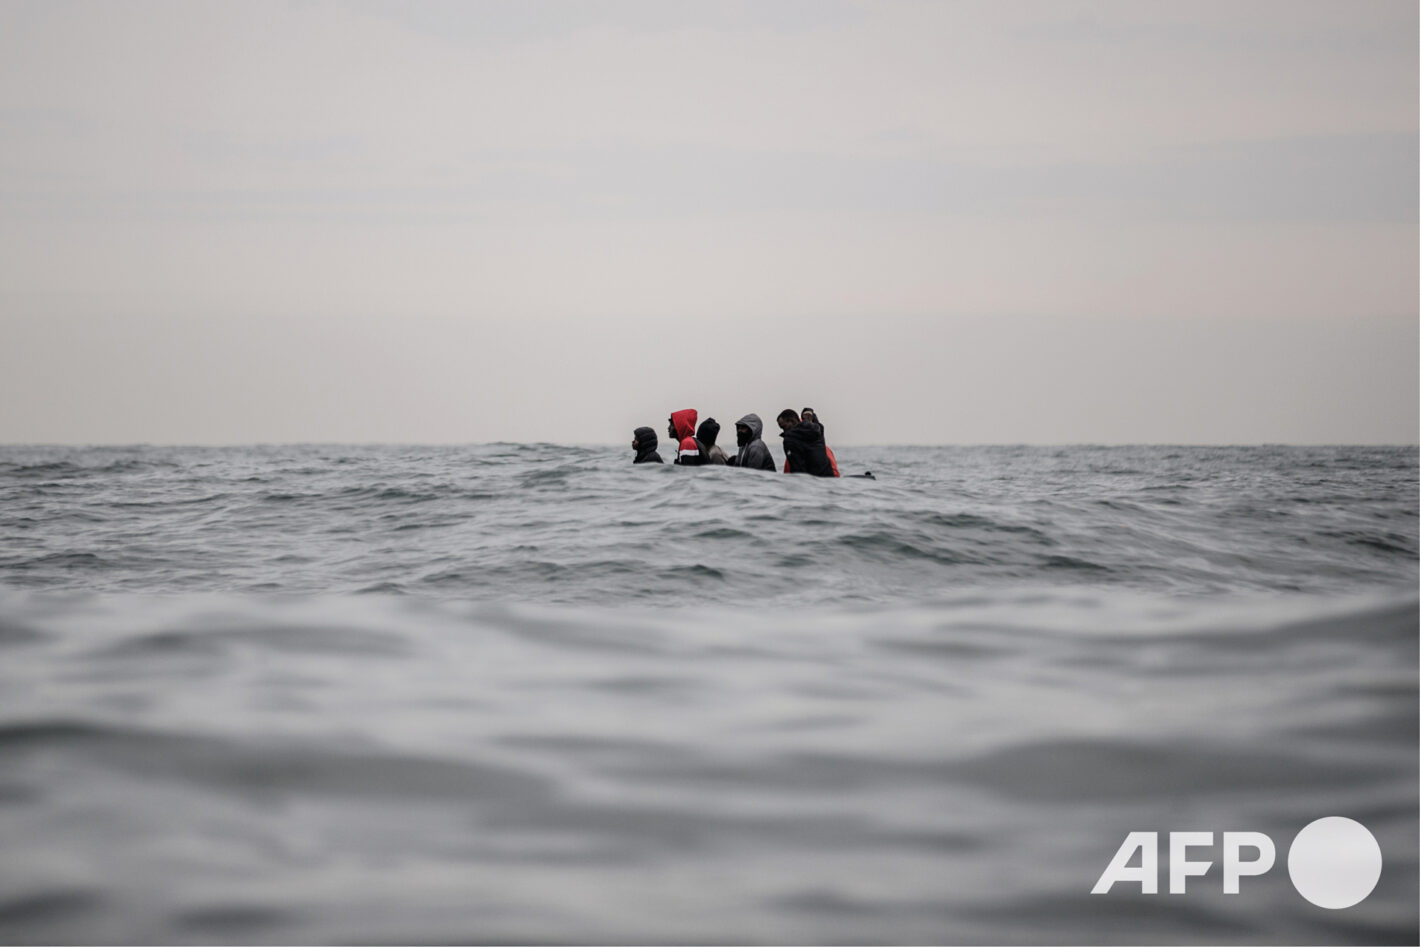 AFP 15 | Sameer AL-DOUMY 27 août 2020 – France